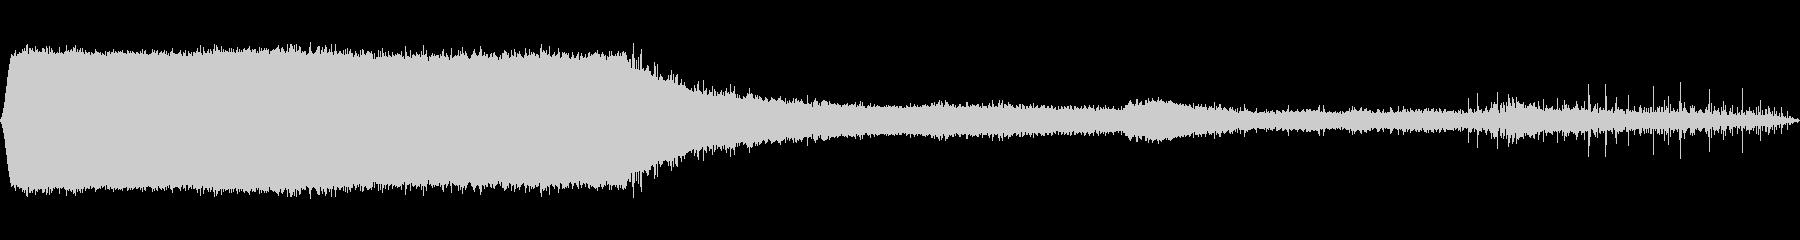 LEARJET 55:EXT:エン...の未再生の波形